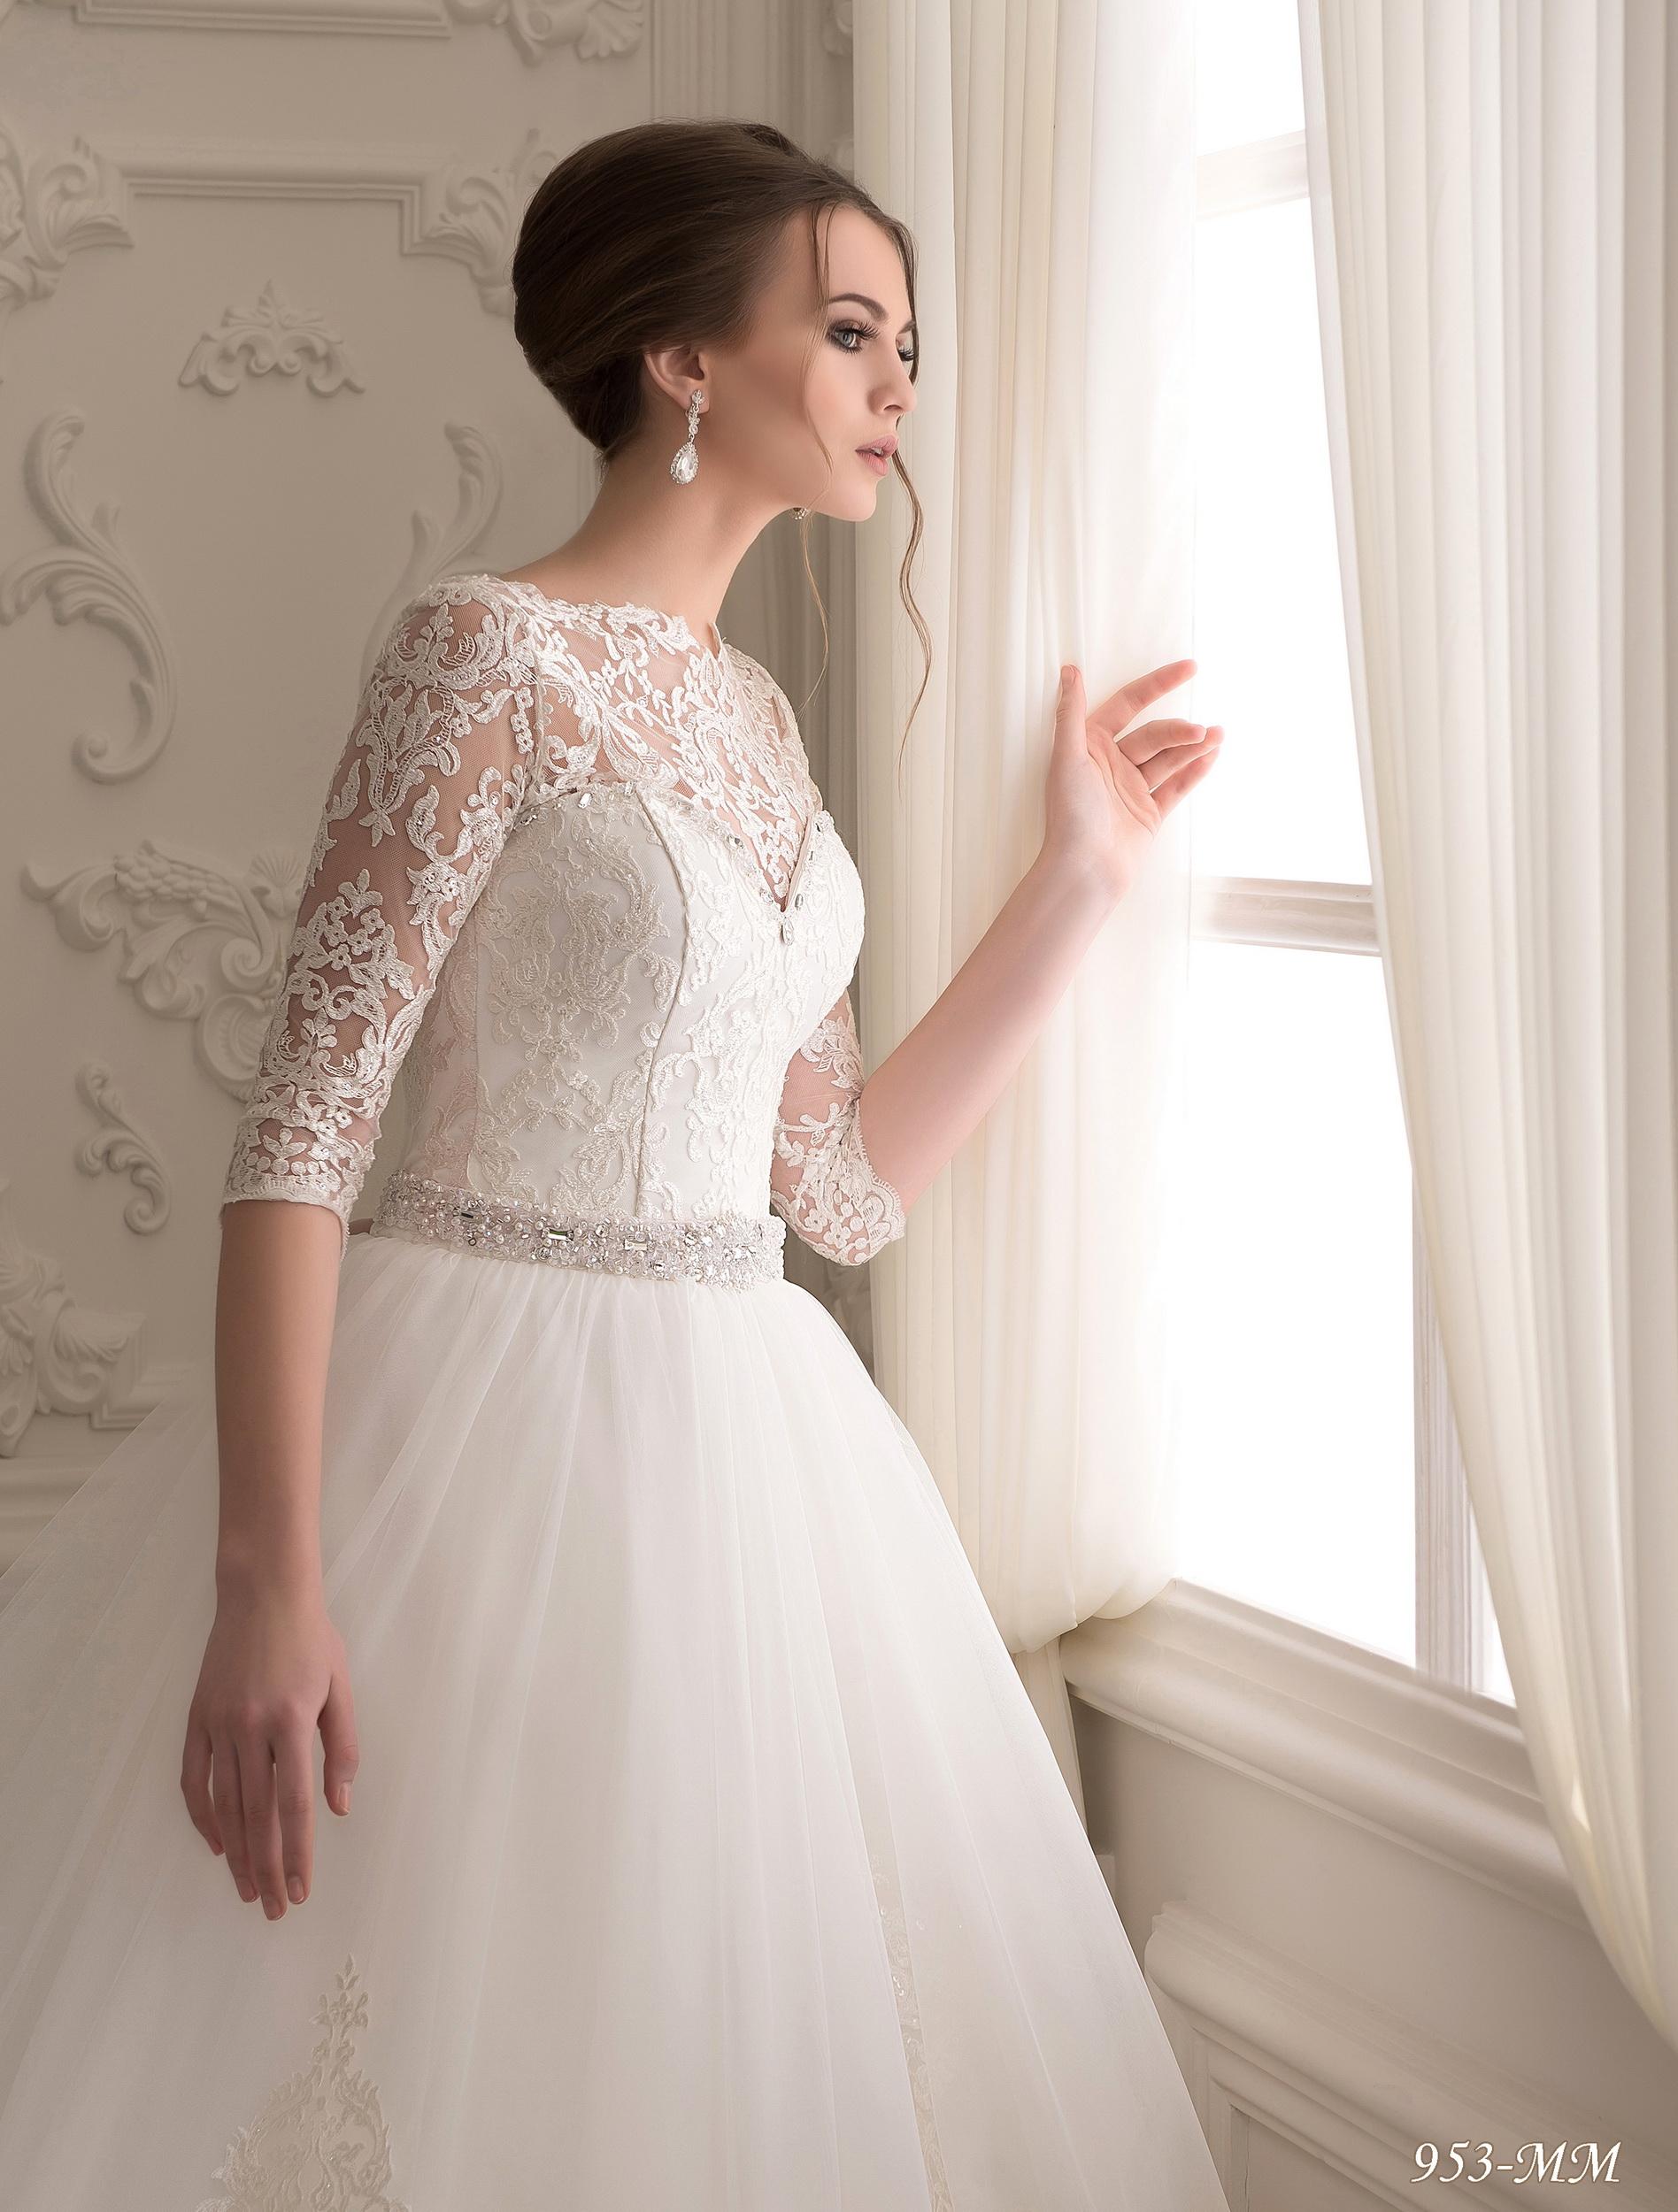 953-MM | Buy wedding dresses wholesale from Pentelei